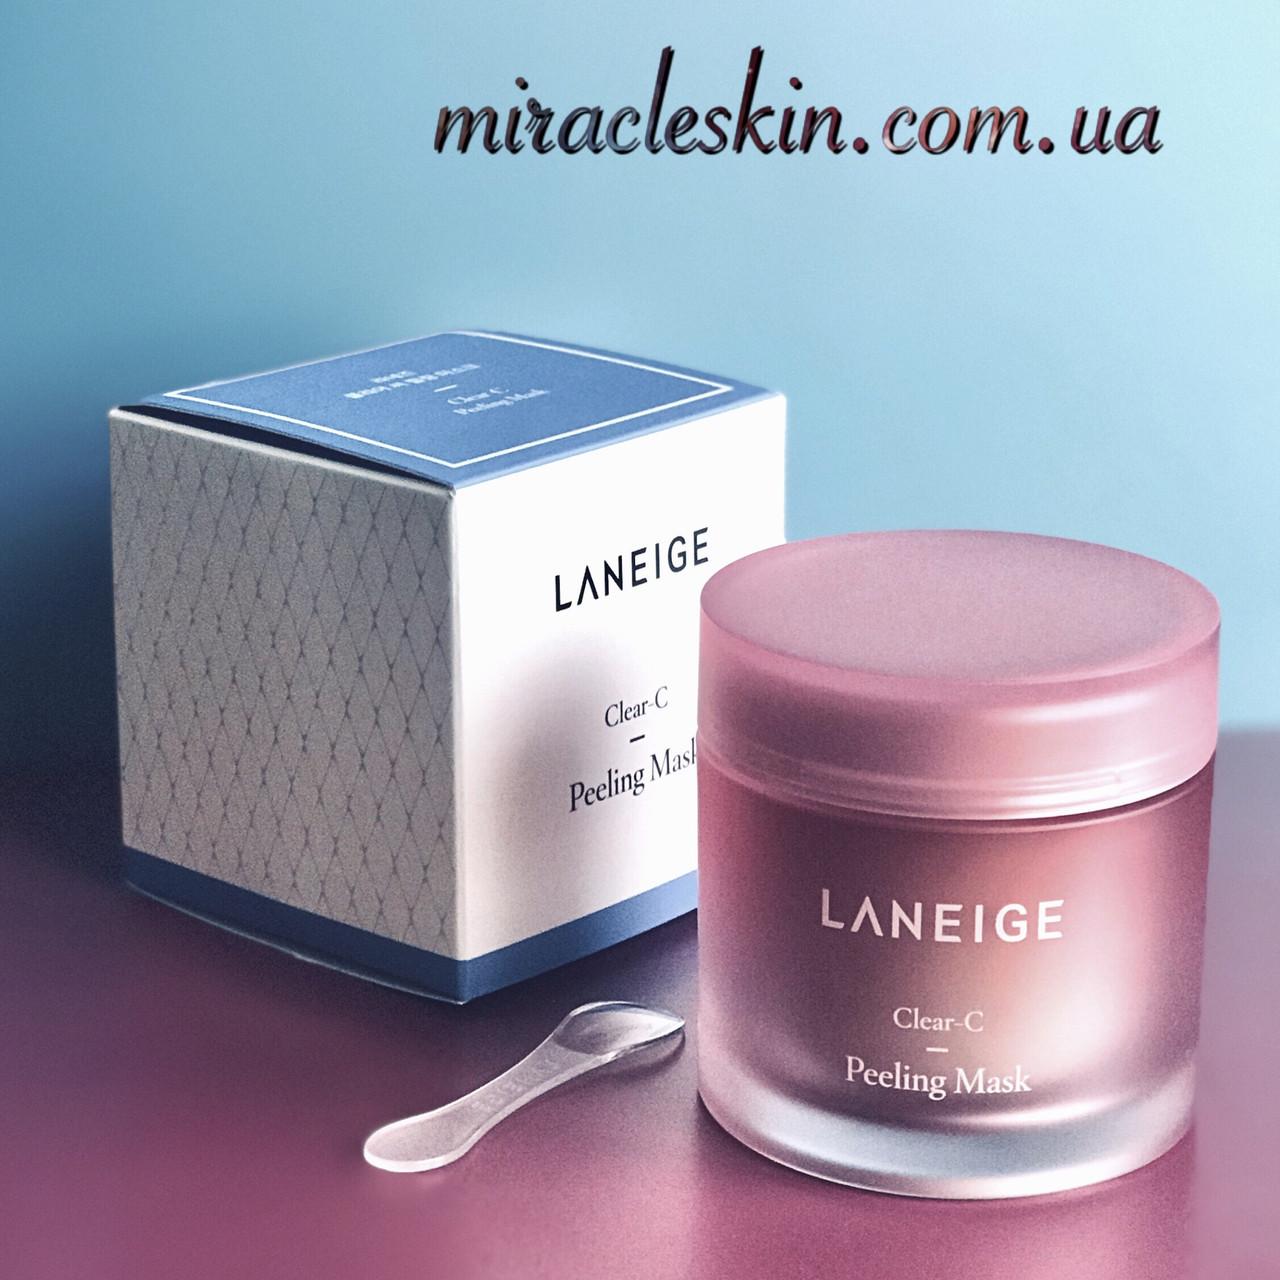 Маска - пилинг Laneige Clear-C Peeling Mask, 70ml